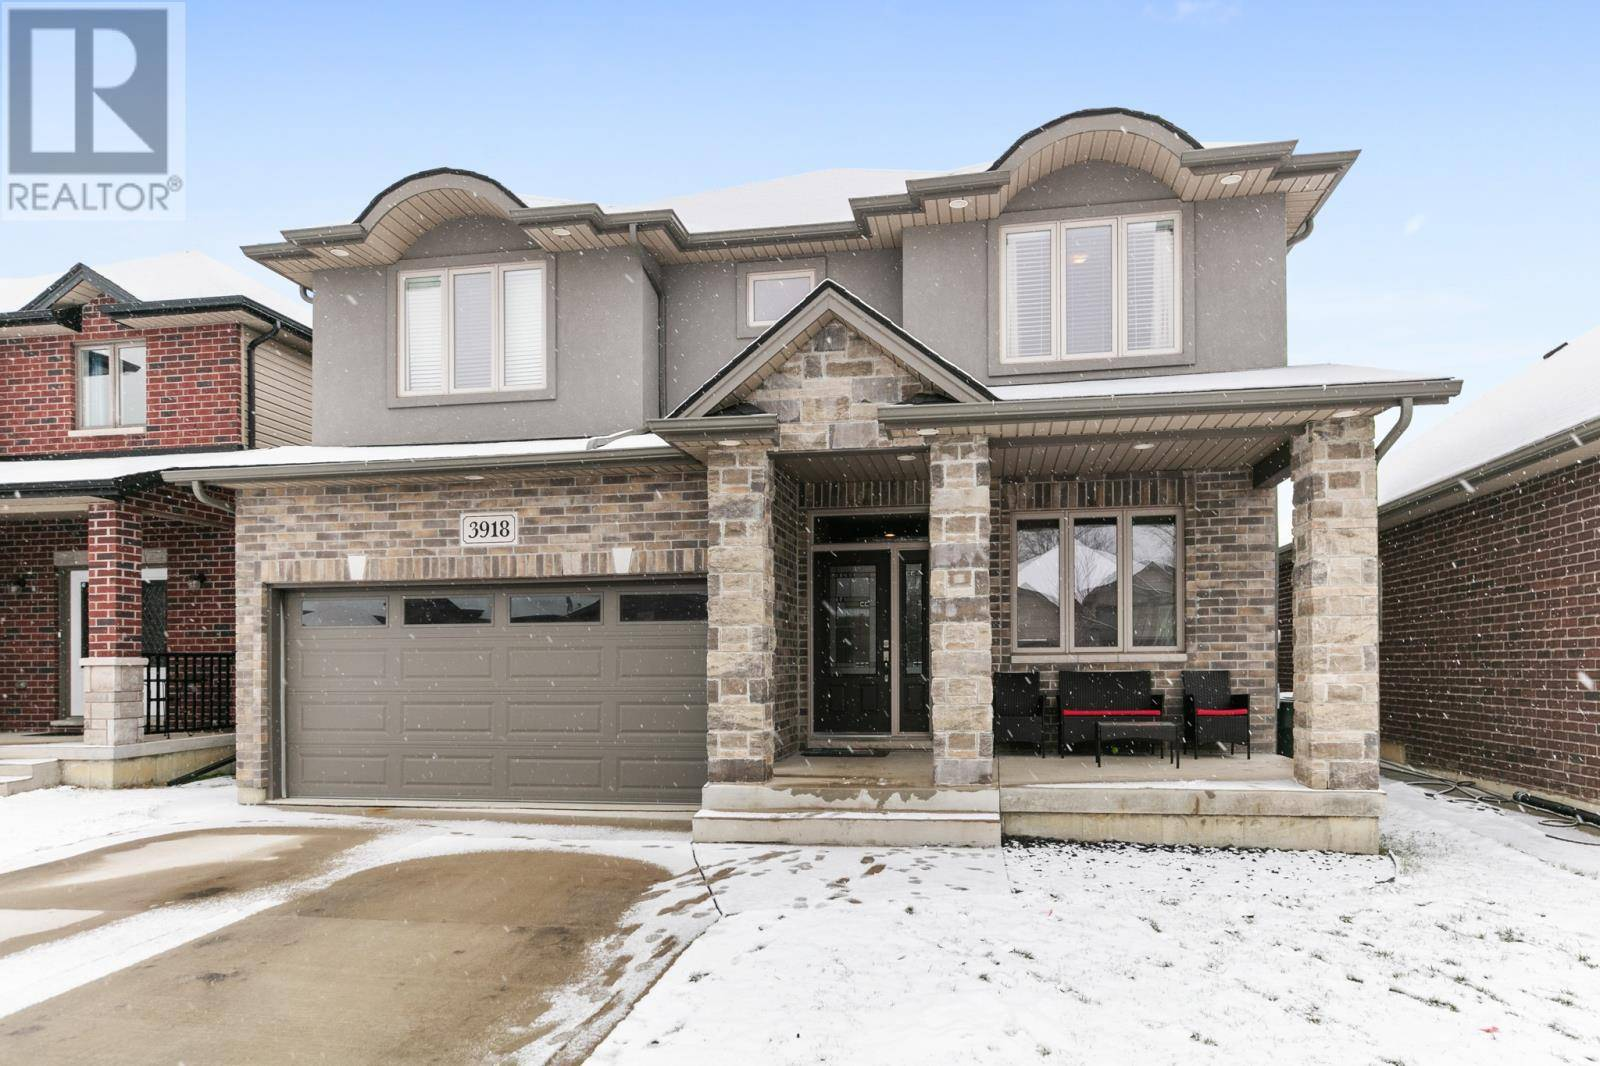 House for sale at 3918 Zanzibar  Windsor Ontario - MLS: 20001854